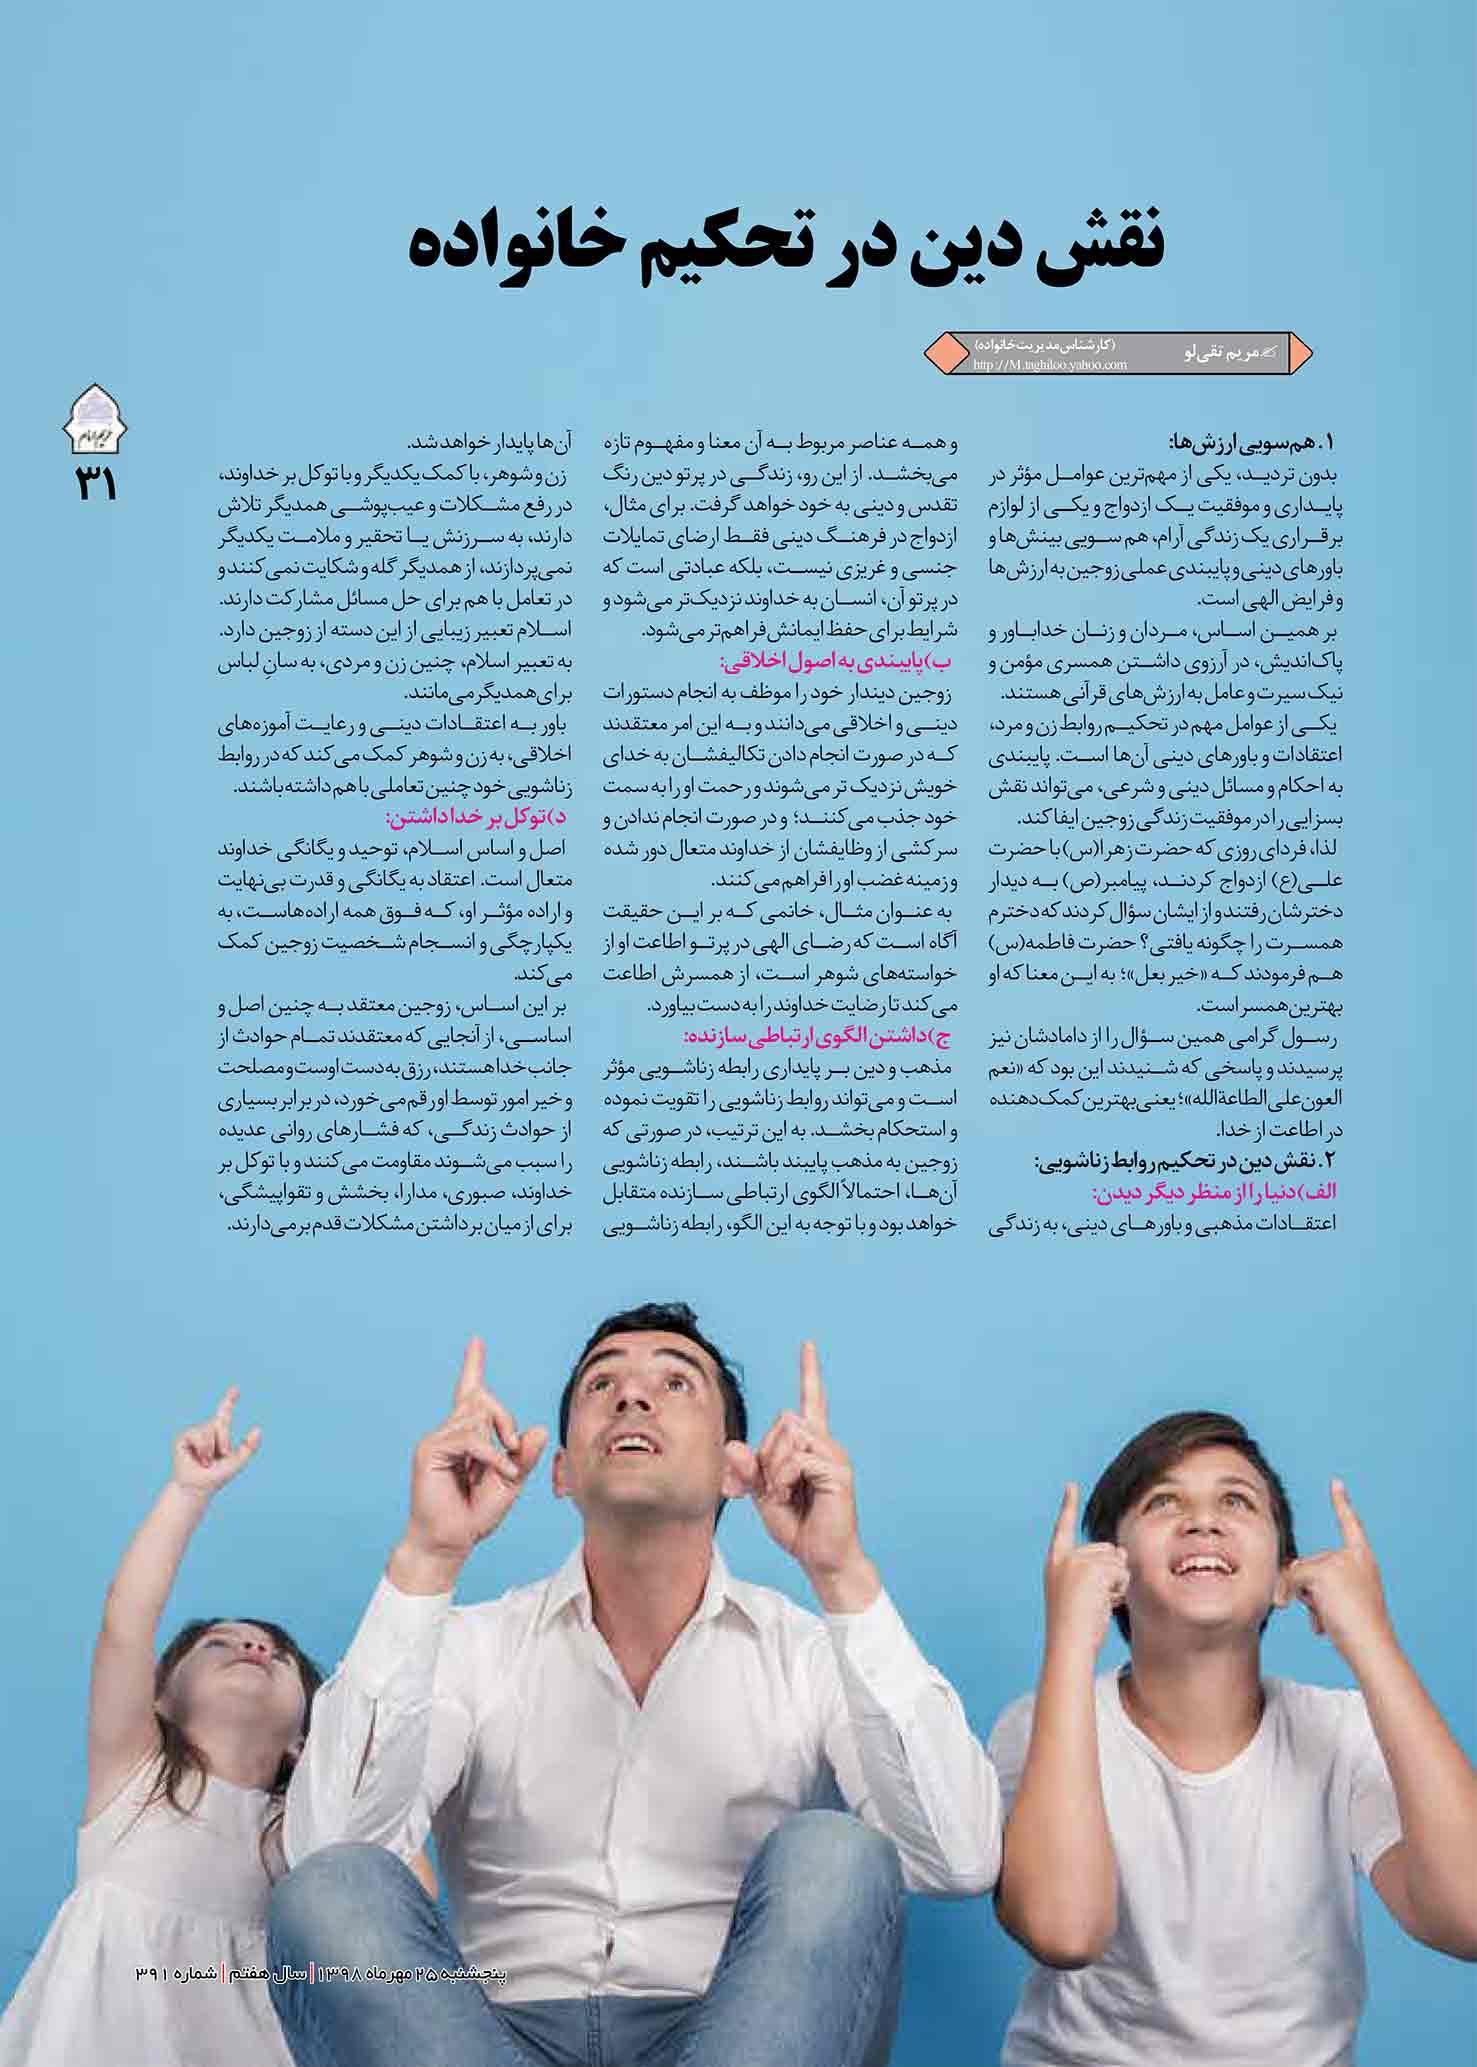 C:\Users\a.khalojini.ICPIKW\Desktop\391\New folder\@harim_emam391-31.jpg